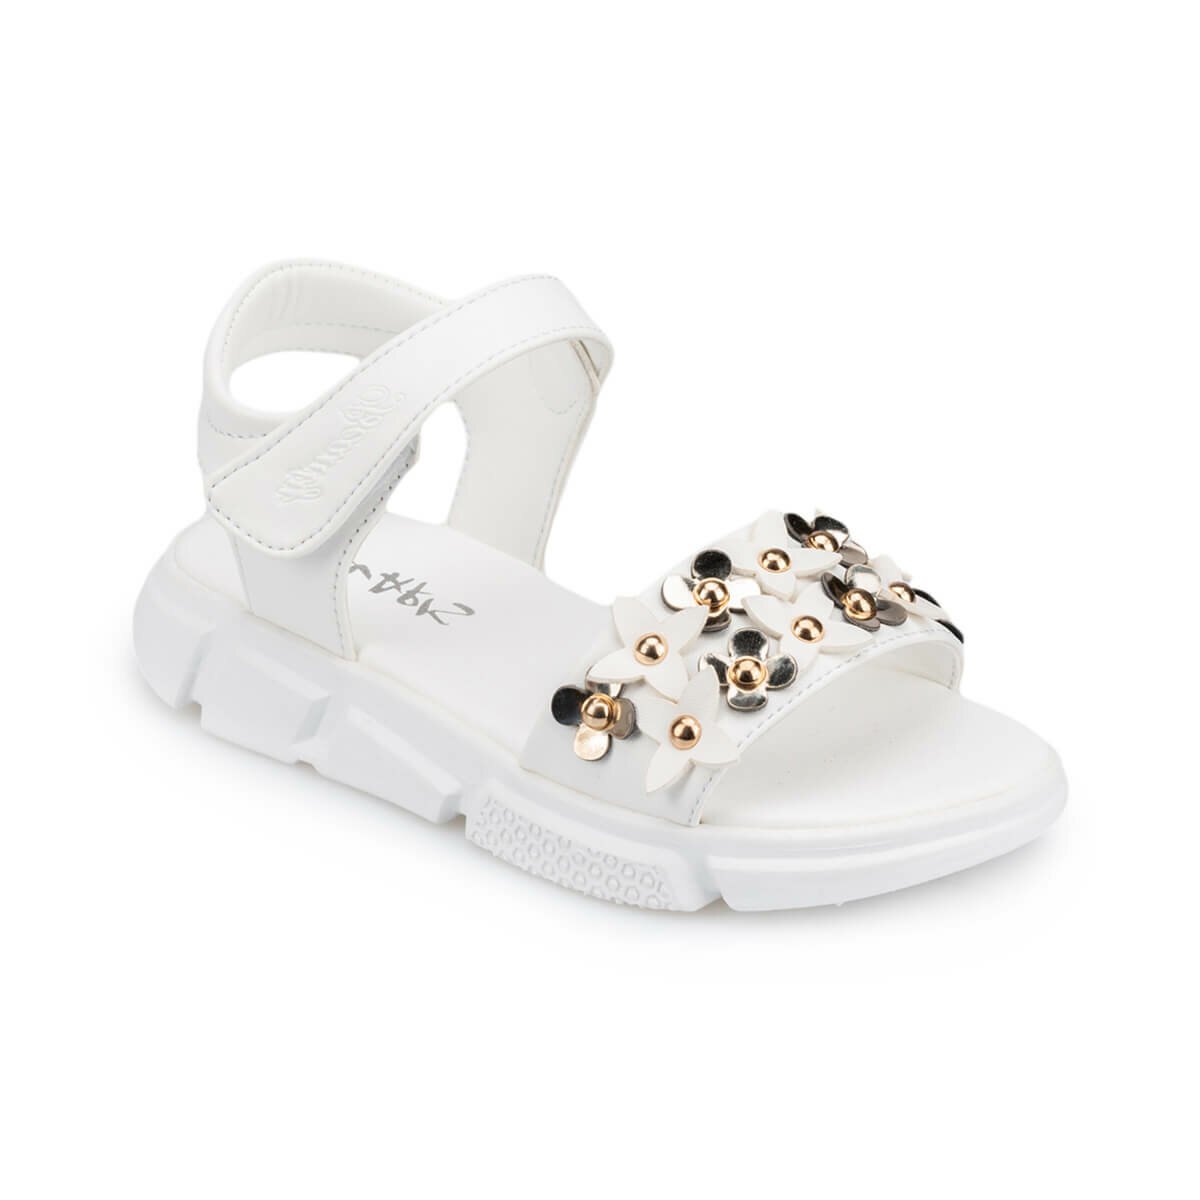 FLO 91.511264.F White Female Child Sandals Polaris